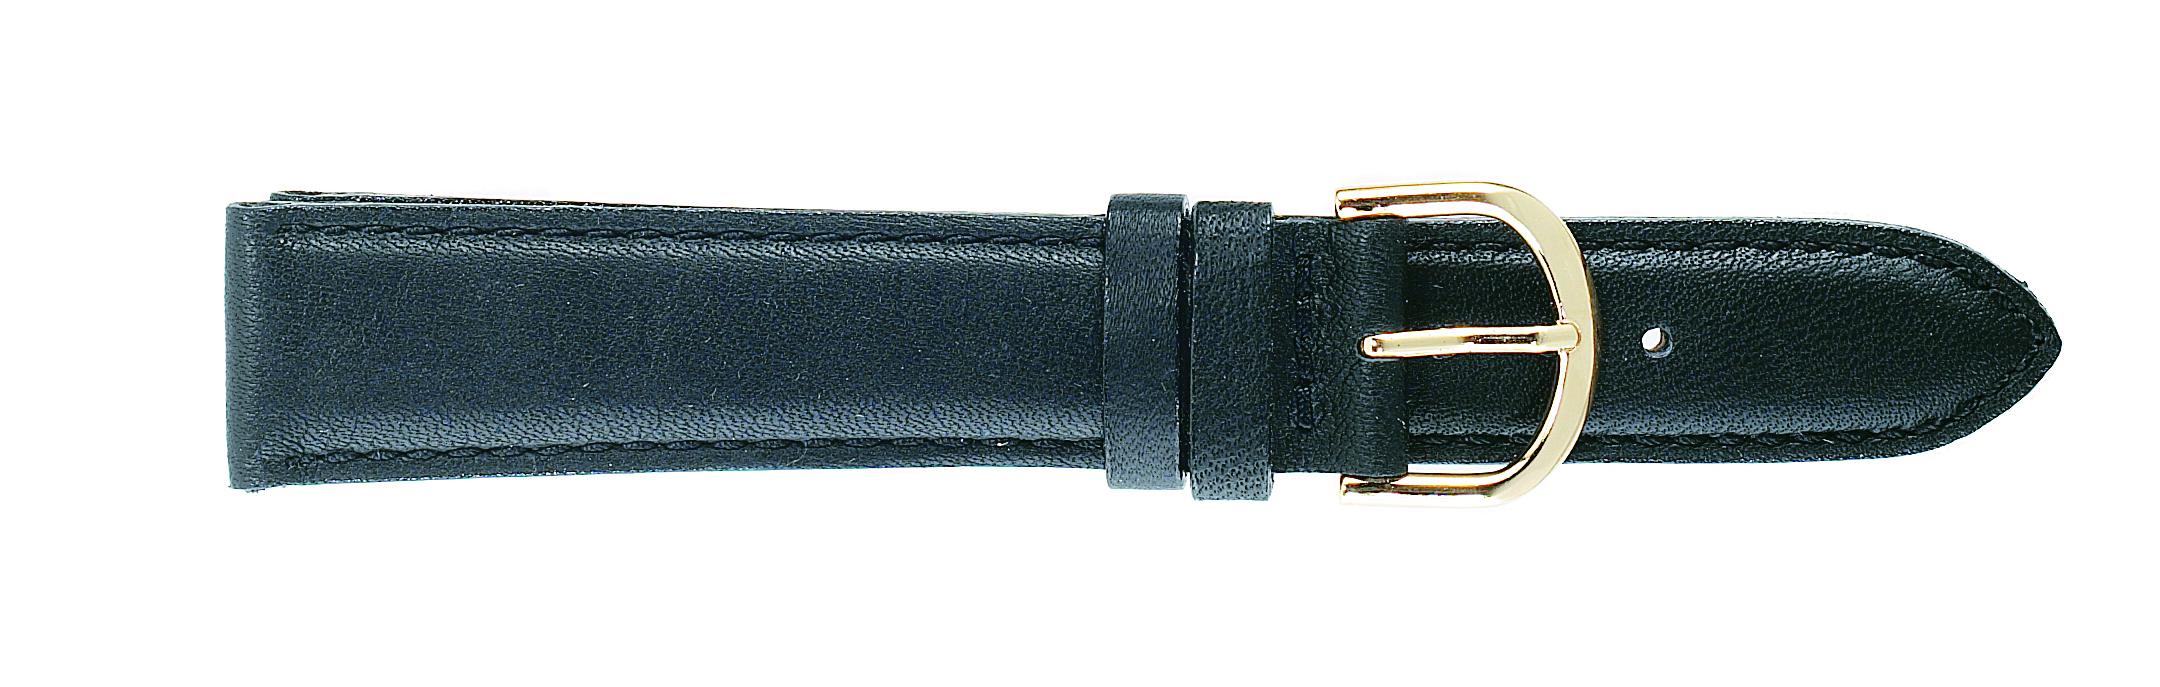 18mm Padded Calf Black Strap